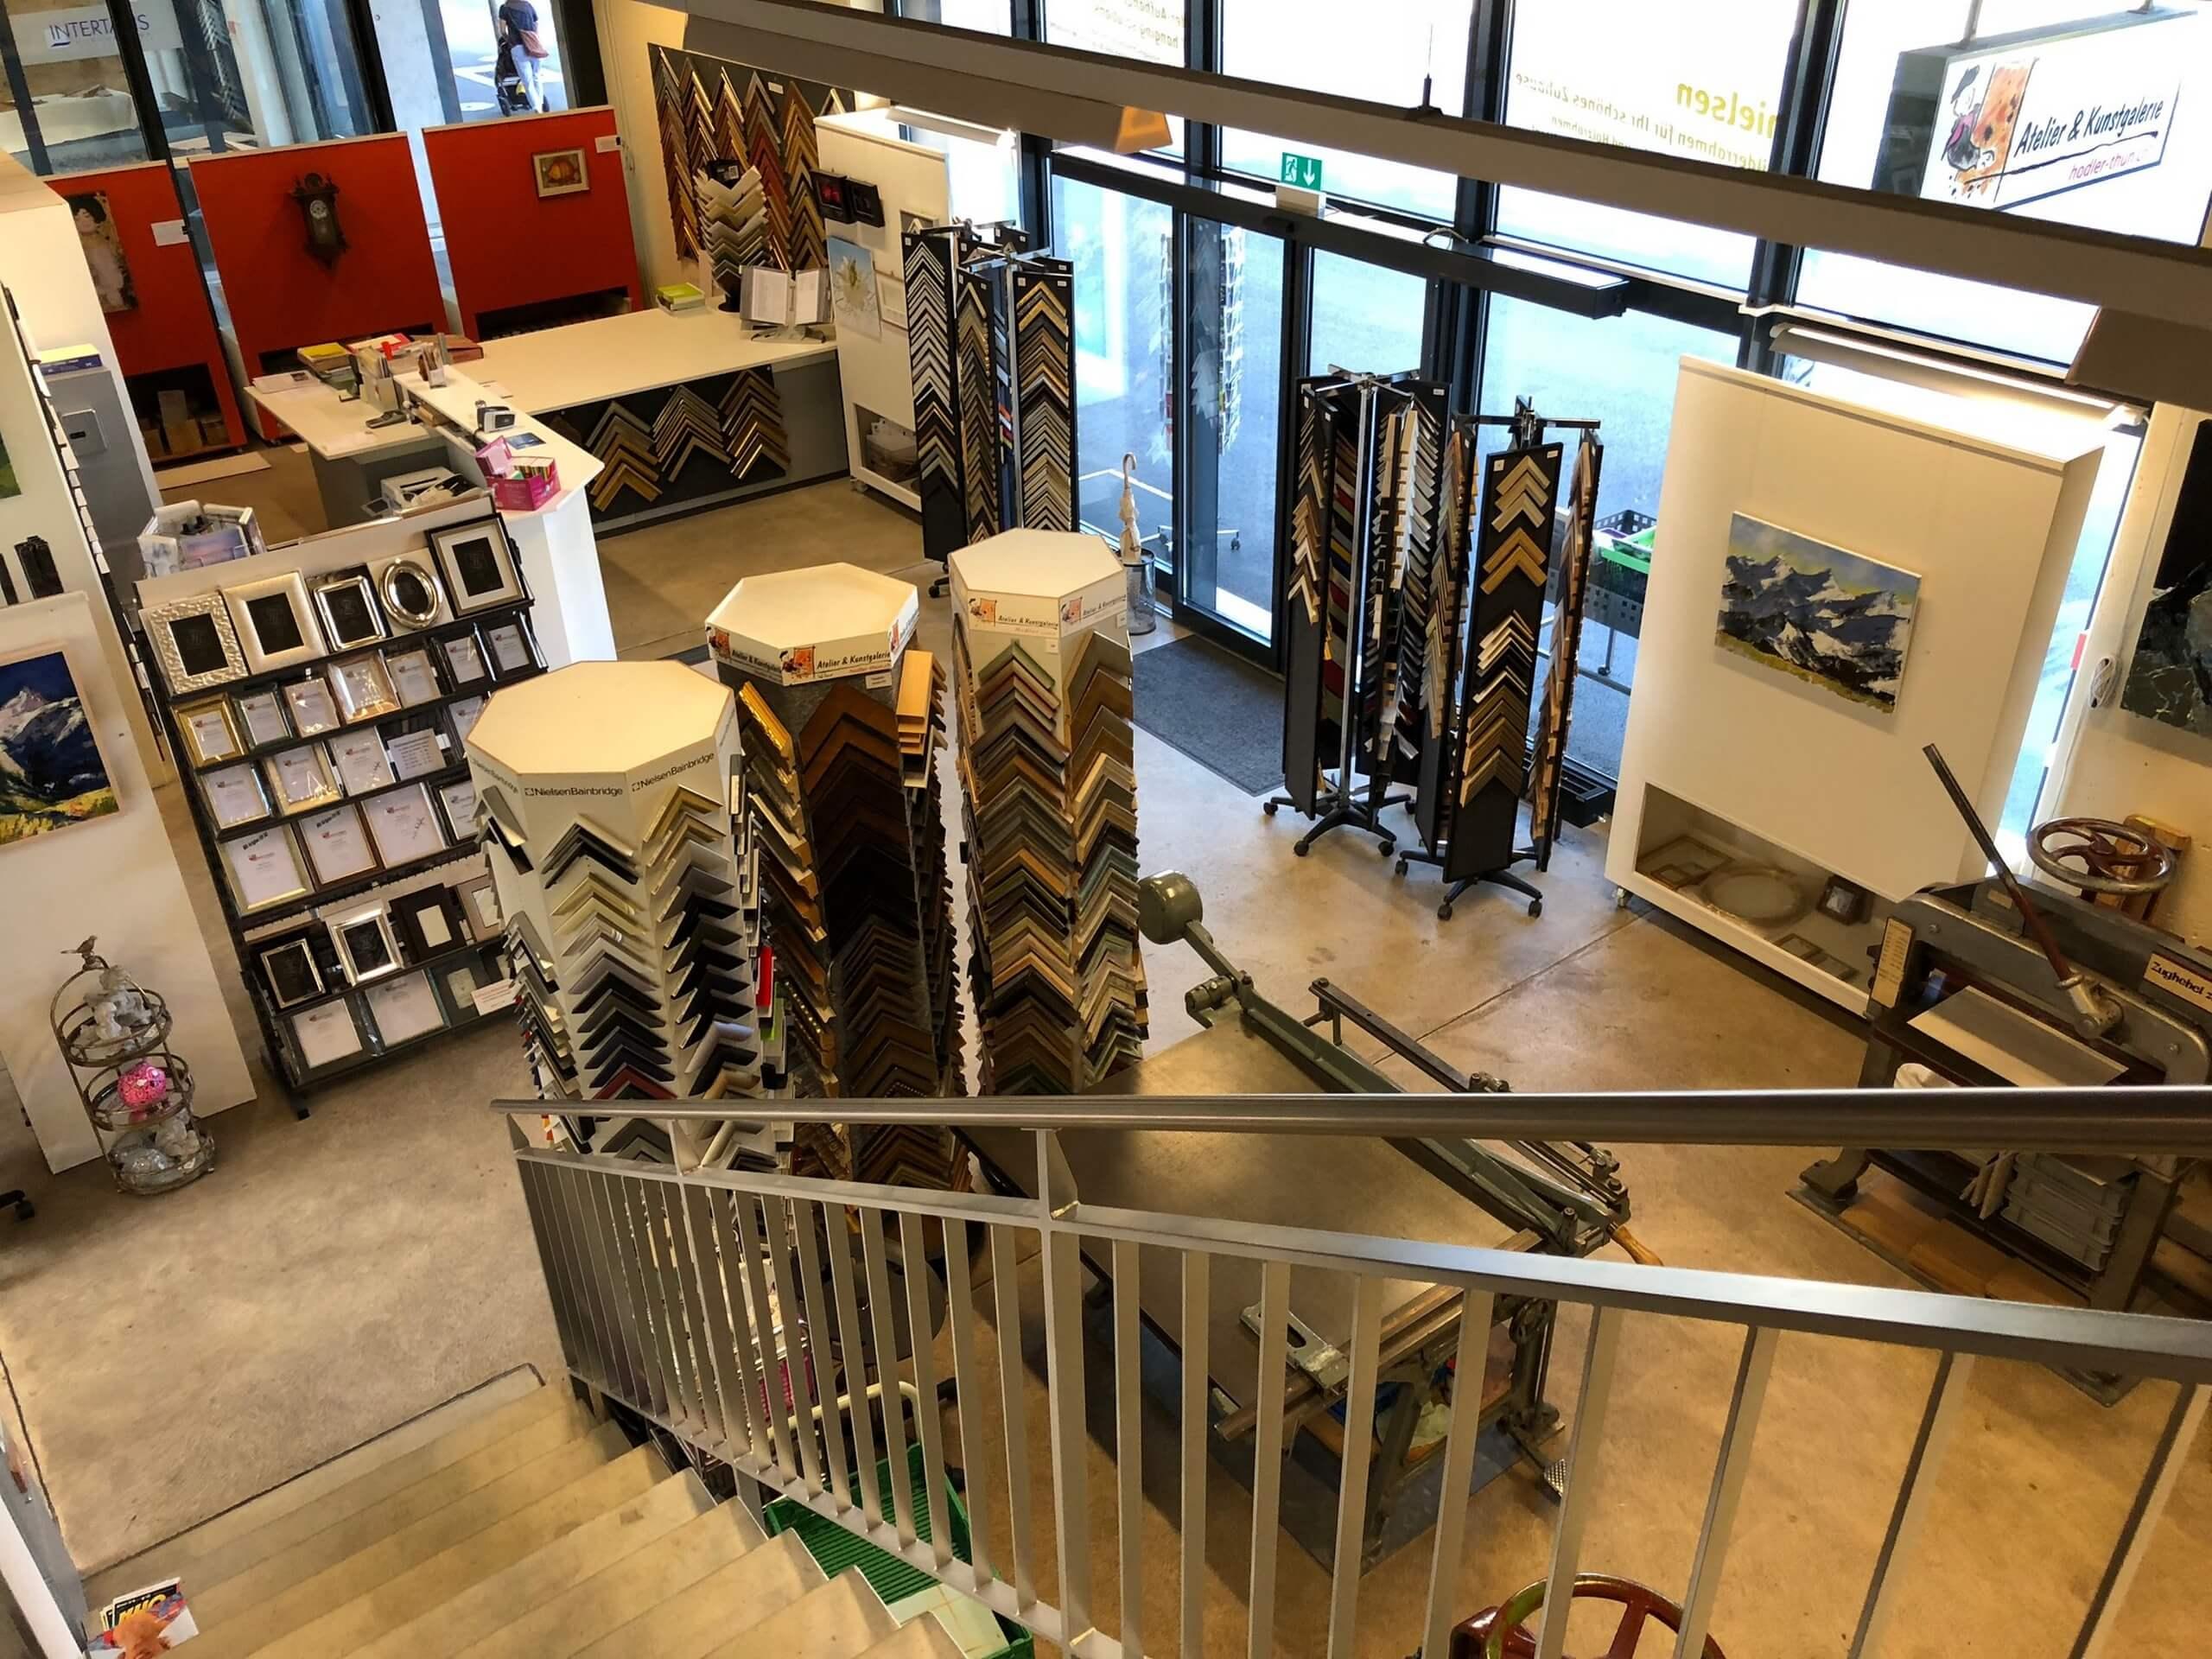 thun-atelier-und-kunstgalerie-hodler-kunst-laden